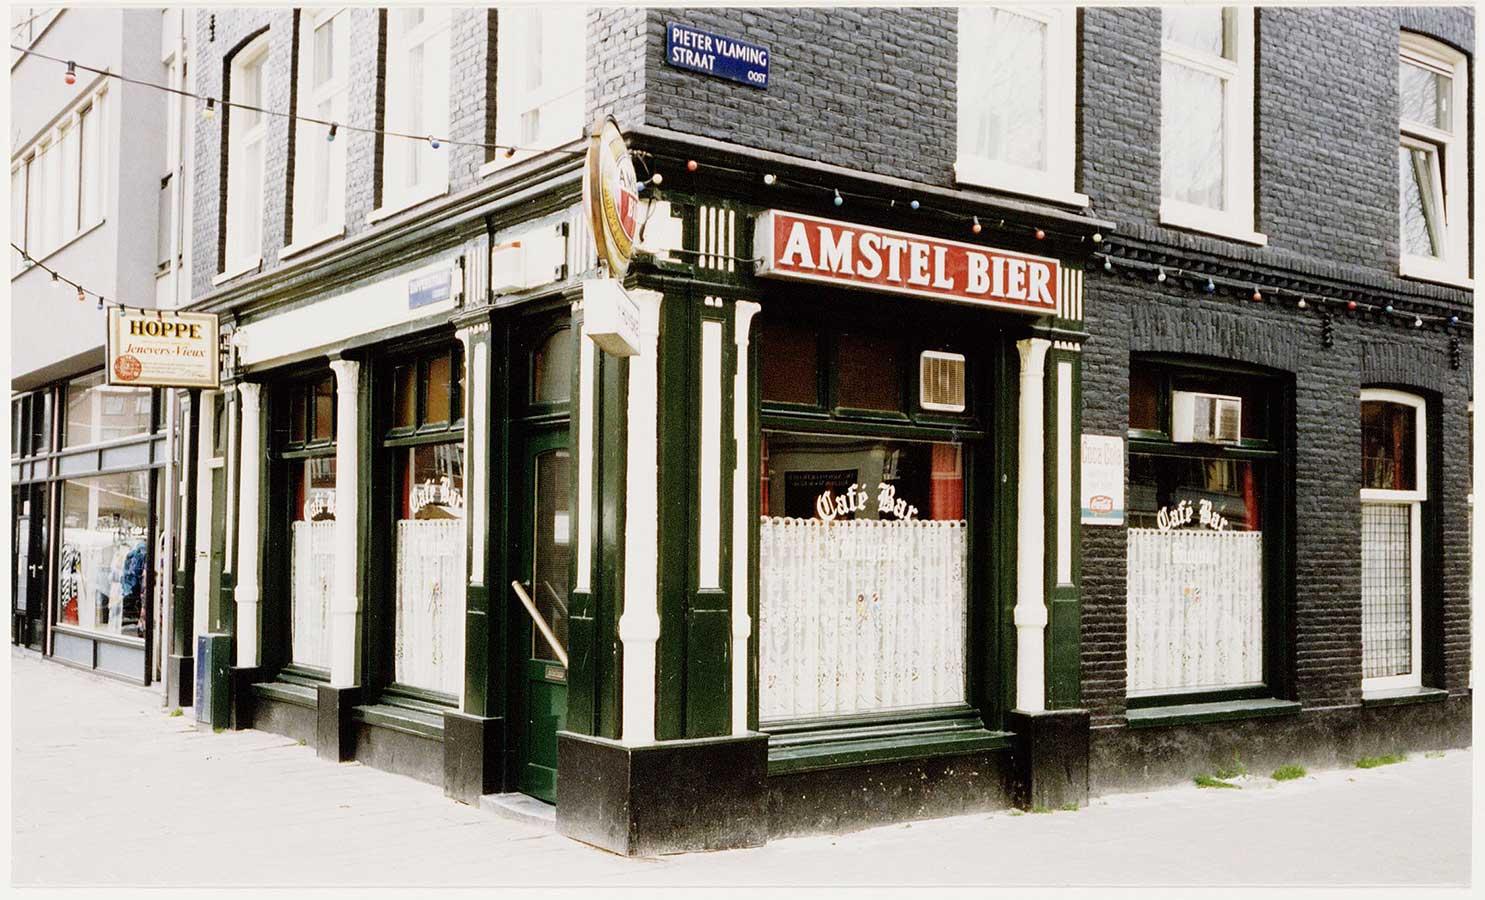 Bar 't Huyske op de hoek Dapperstraat/Pieter Vlamingstraat